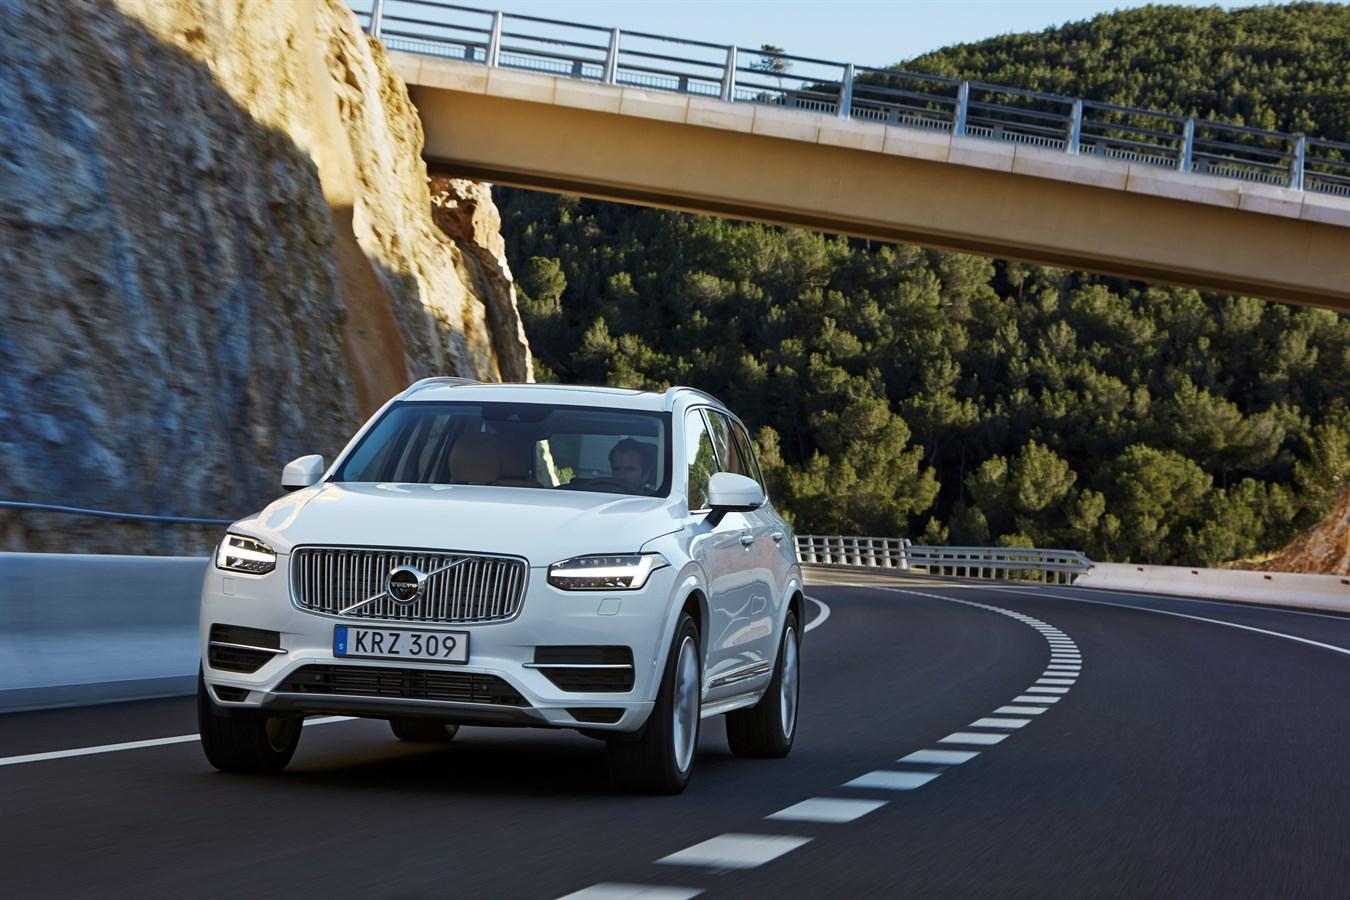 The new Volvo XC90 T8 Twin Engine petrol plug-in hybrid driven in Tarragona, Spain